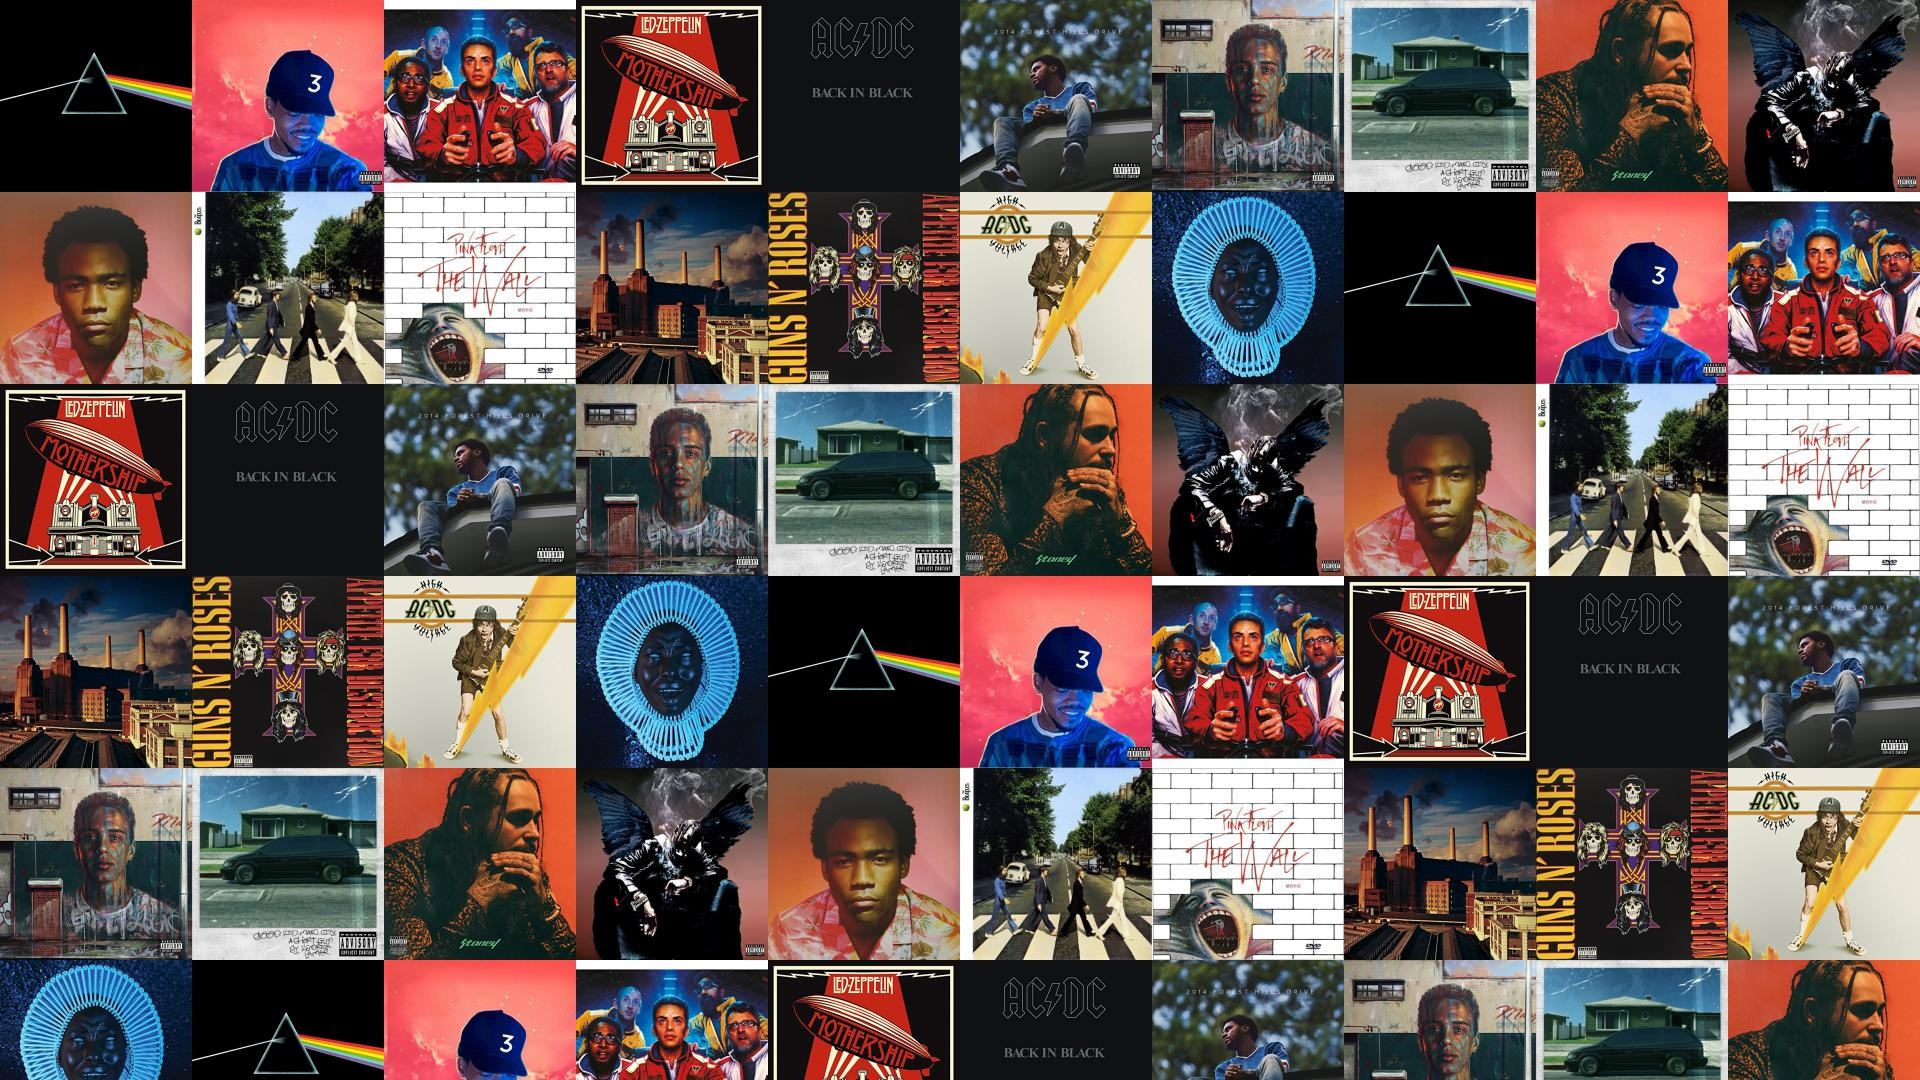 62+ Pink Floyd Album Covers